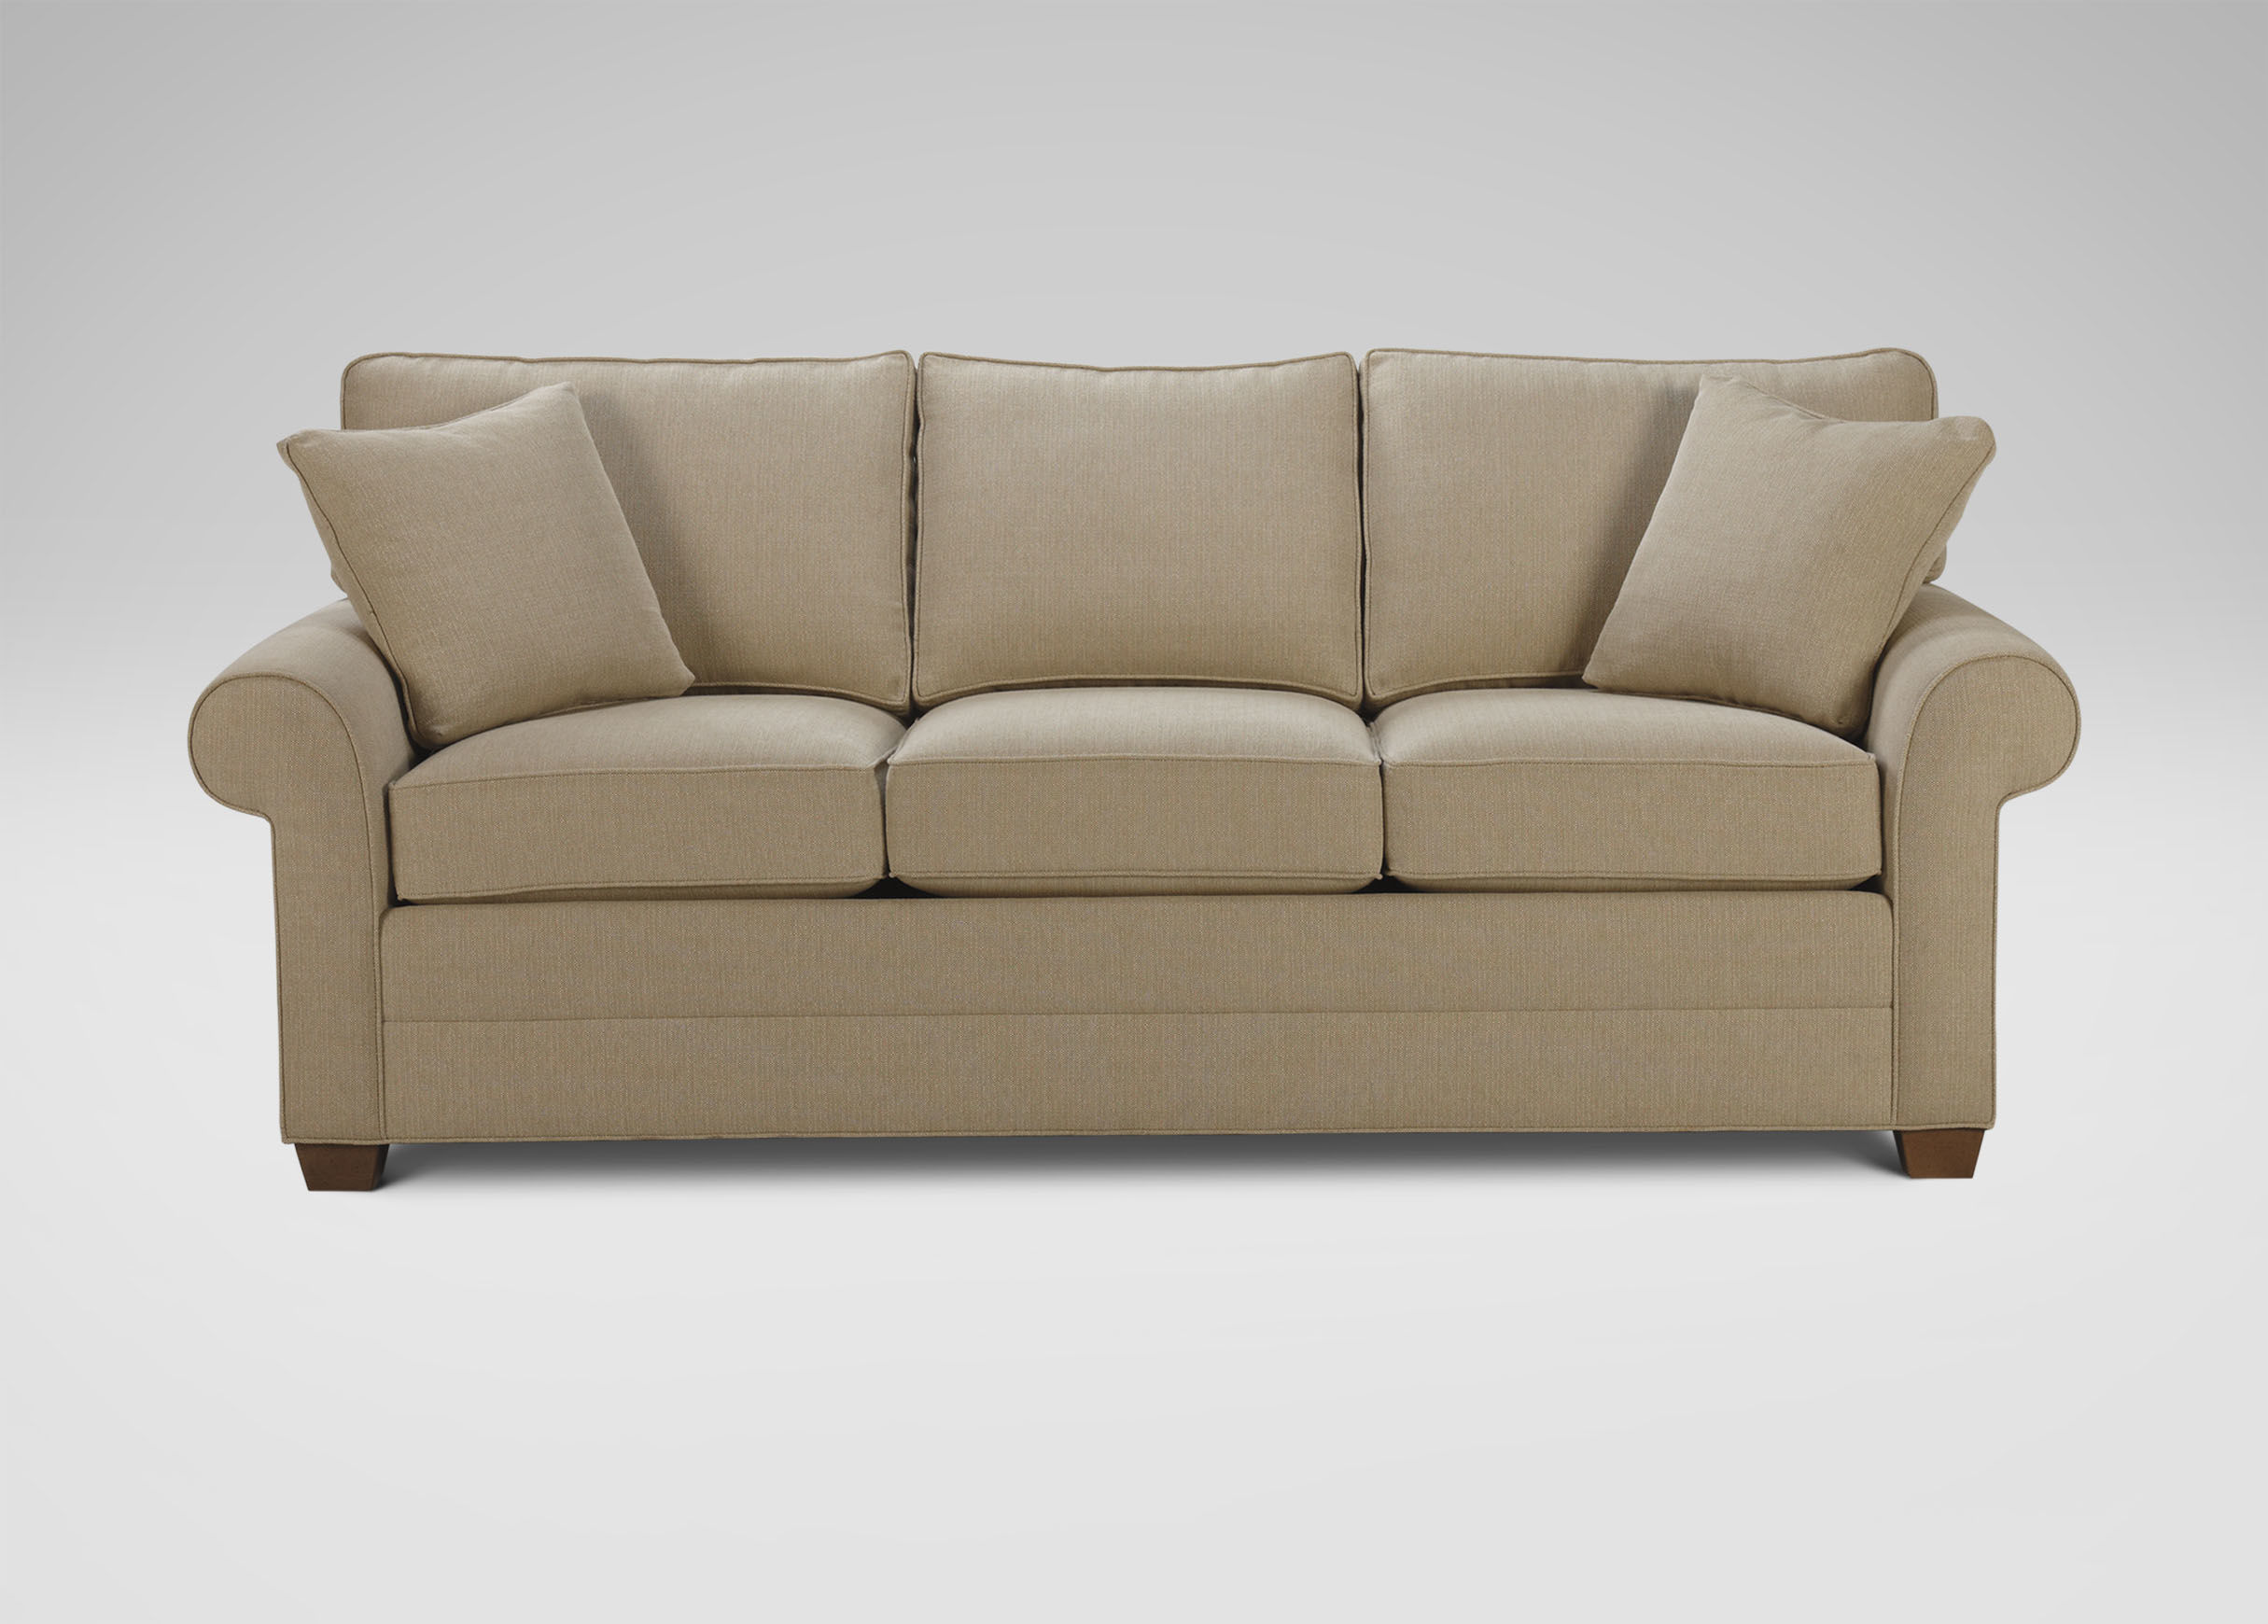 Ethan allen sofa sleepers hudson sofa sofas loveseats for Ethan allen hudson sofa